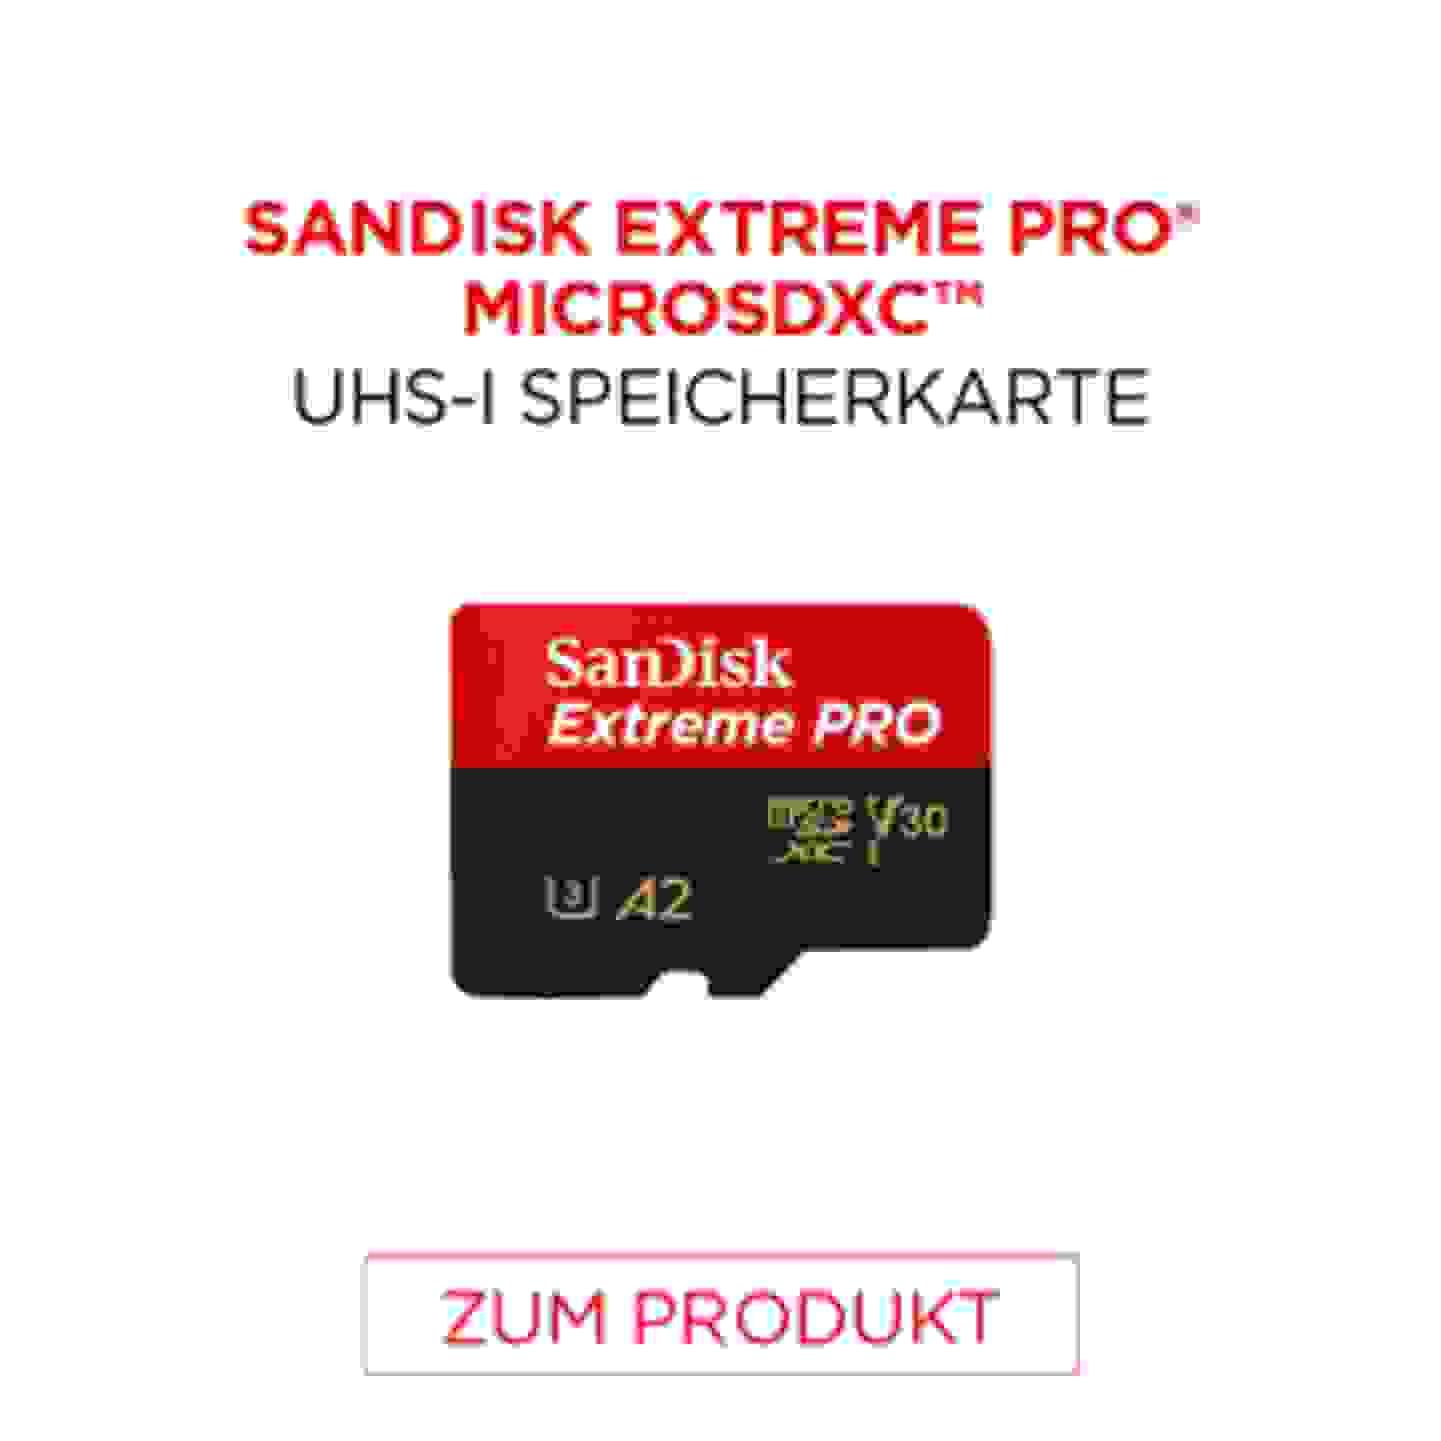 Sandisk Extreme Pro MICROSDXC UHS-I Speicherkarte